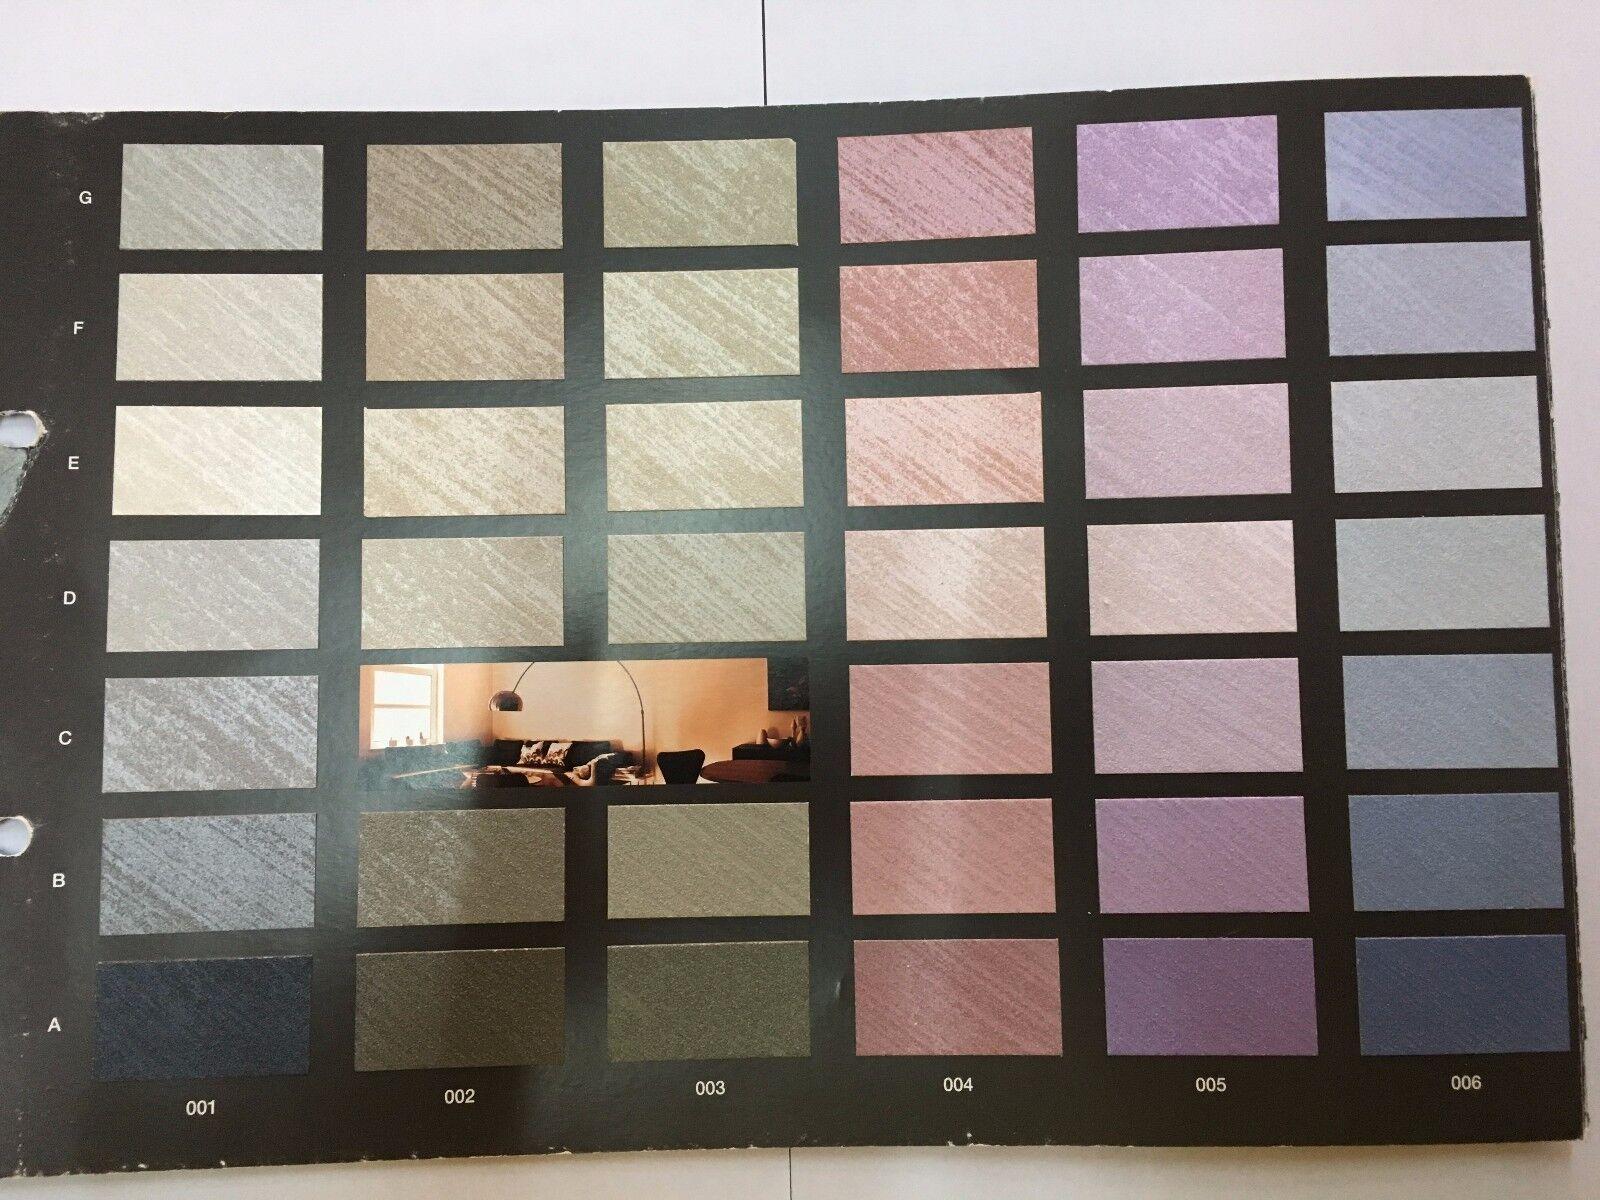 Pittura sabbiata decorativa per muri interni 122 colori lt for Pittura muri interni